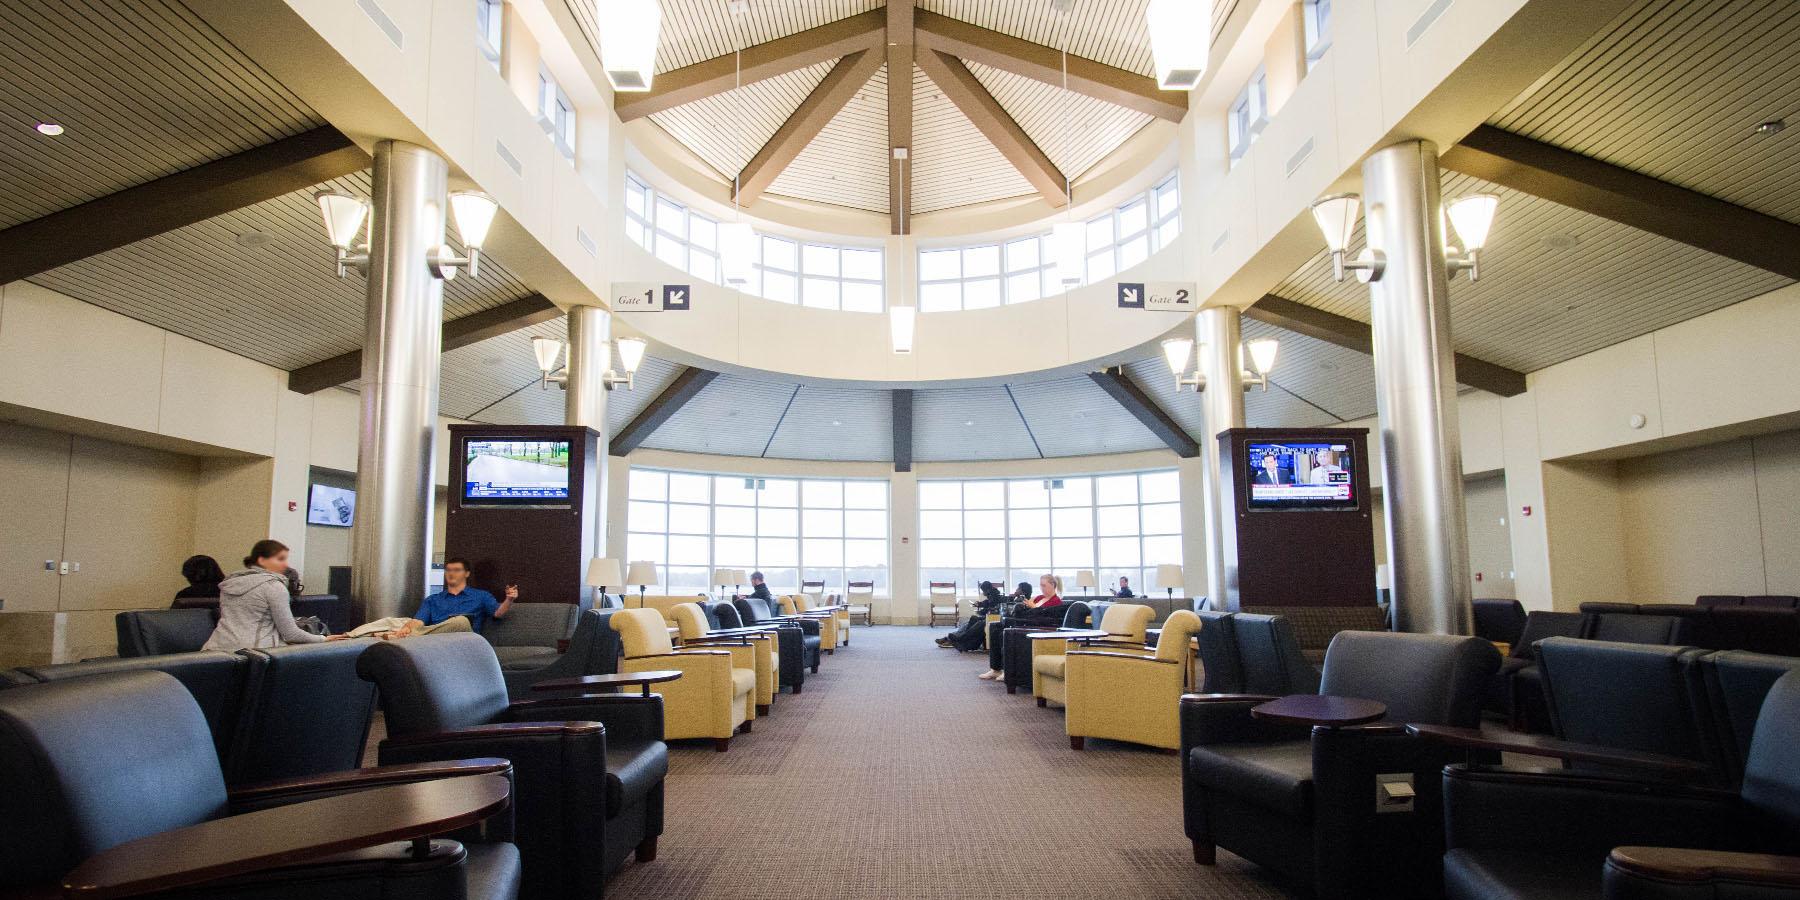 Pitt Greenville Airport second floor mezzanine